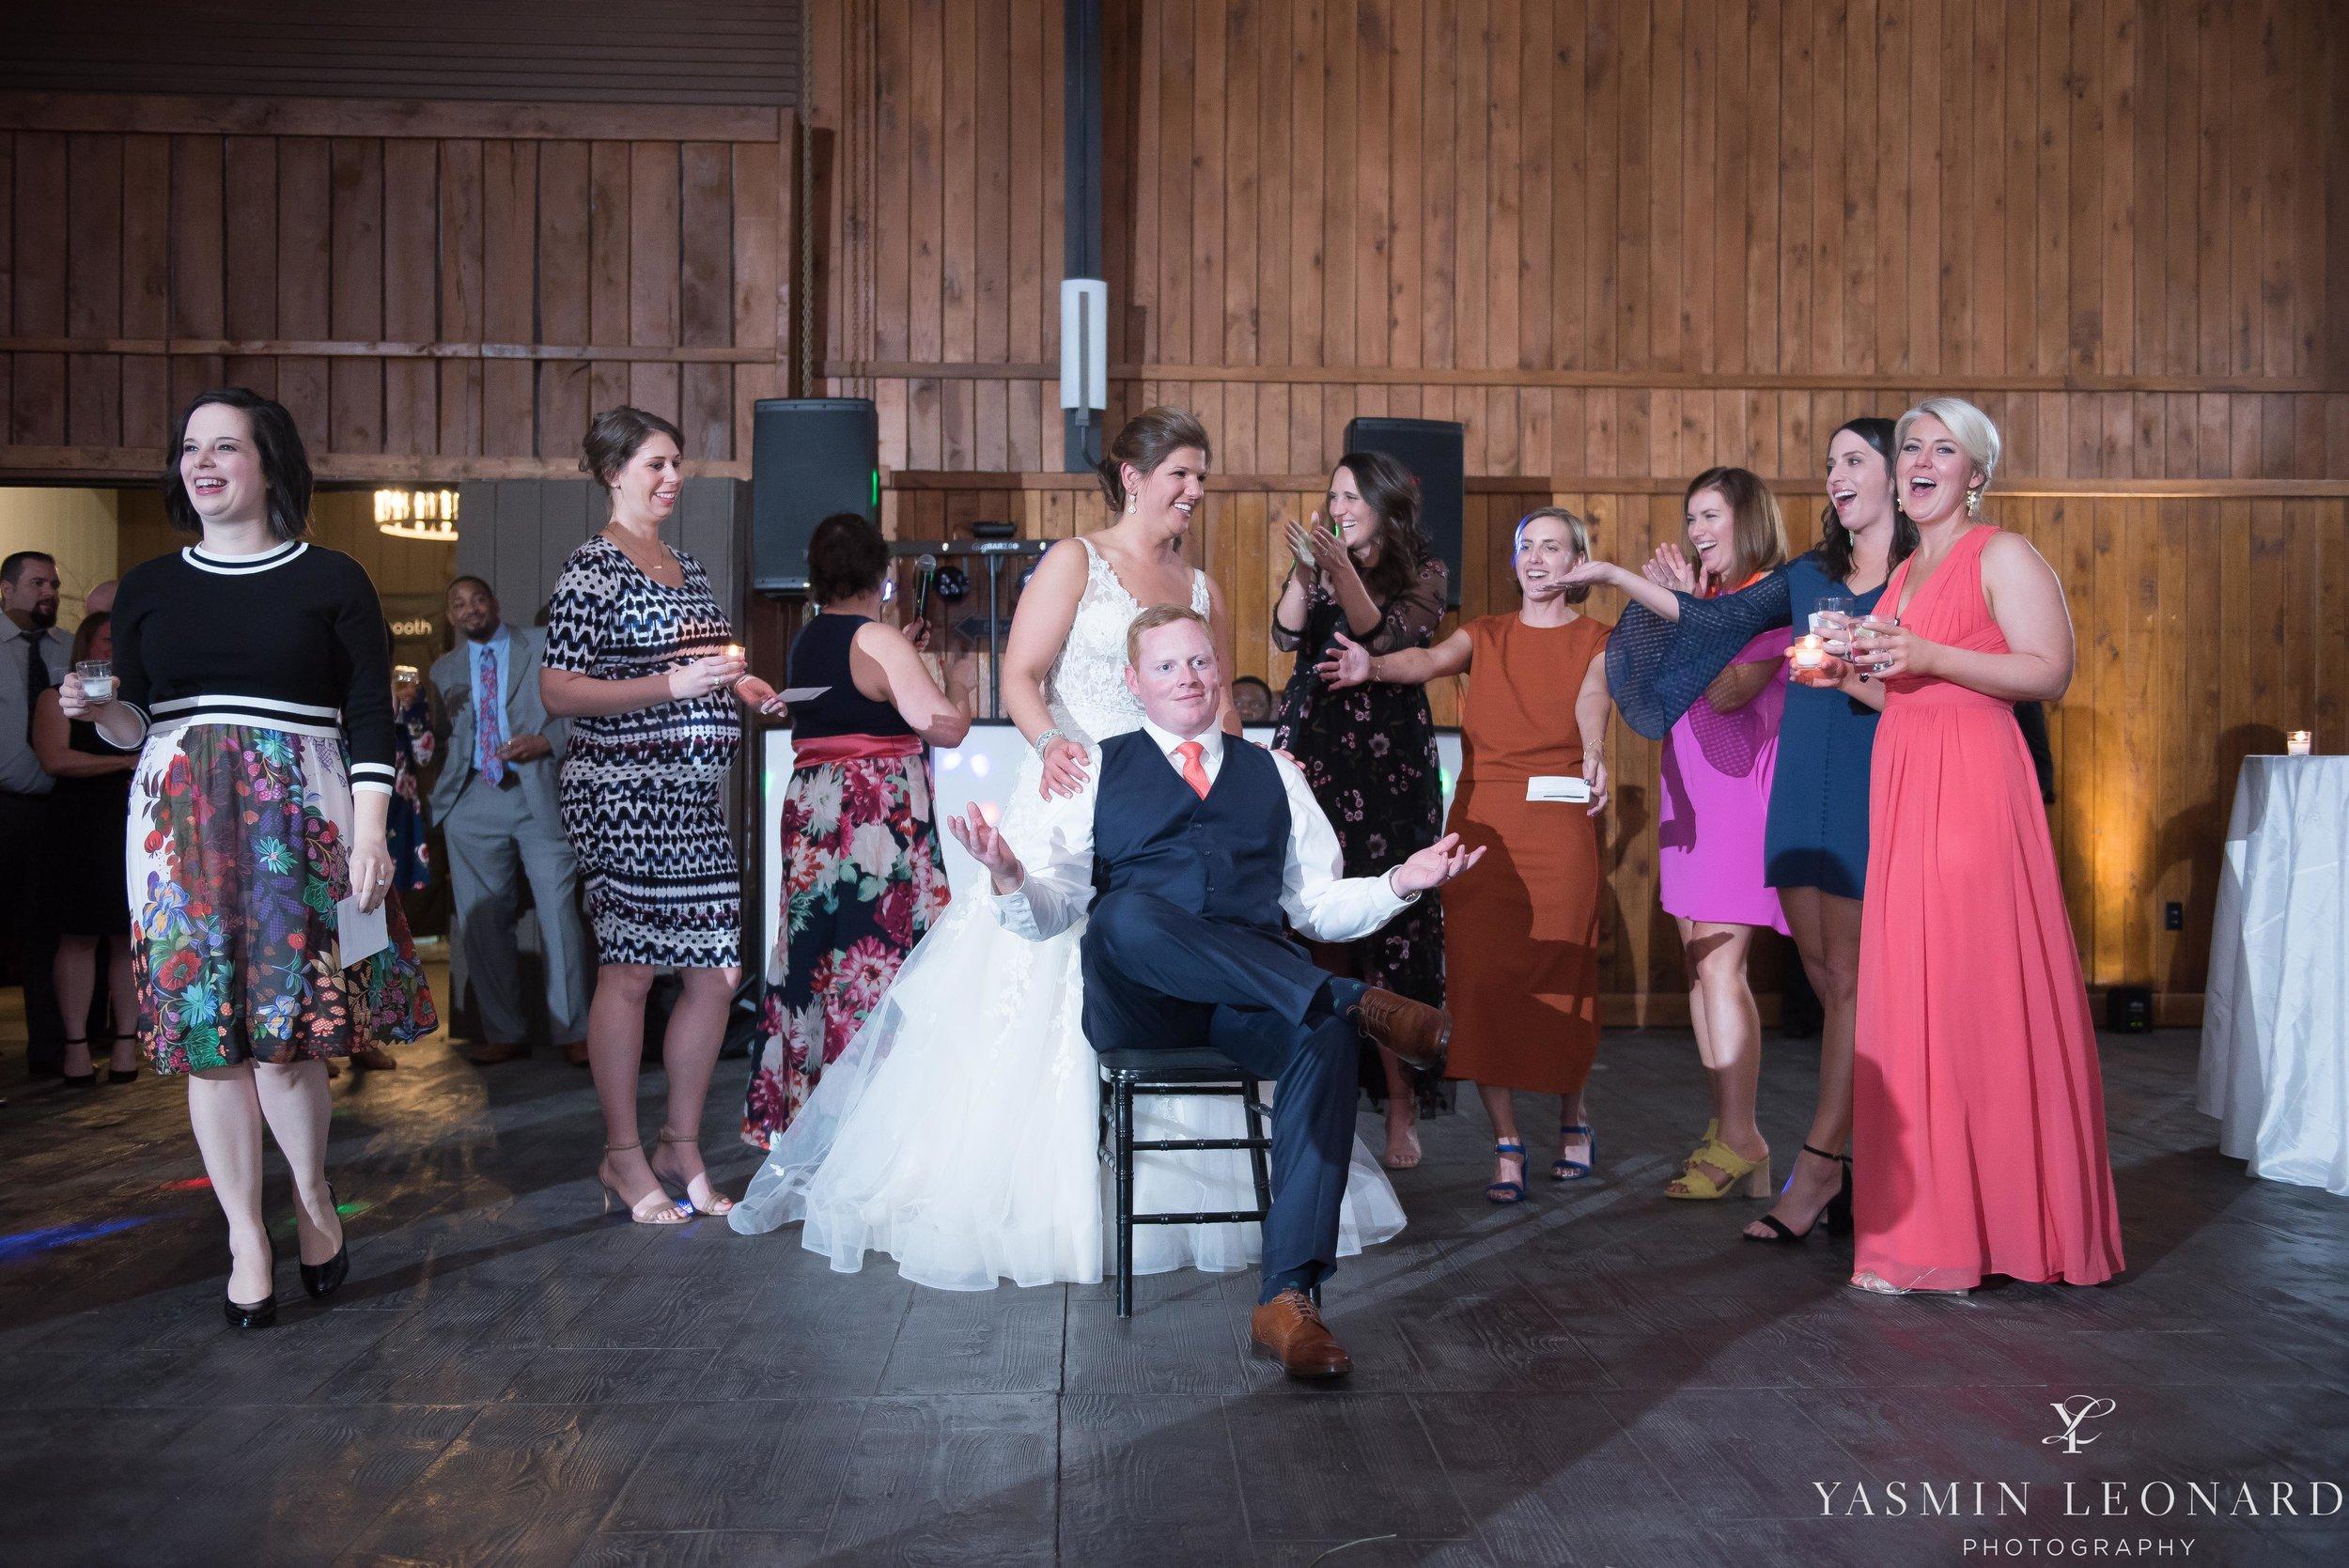 Adaumont Farm - Adaumont Farm Weddings - Trinity Weddings - NC Weddings - Yasmin Leonard Photography-85.jpg